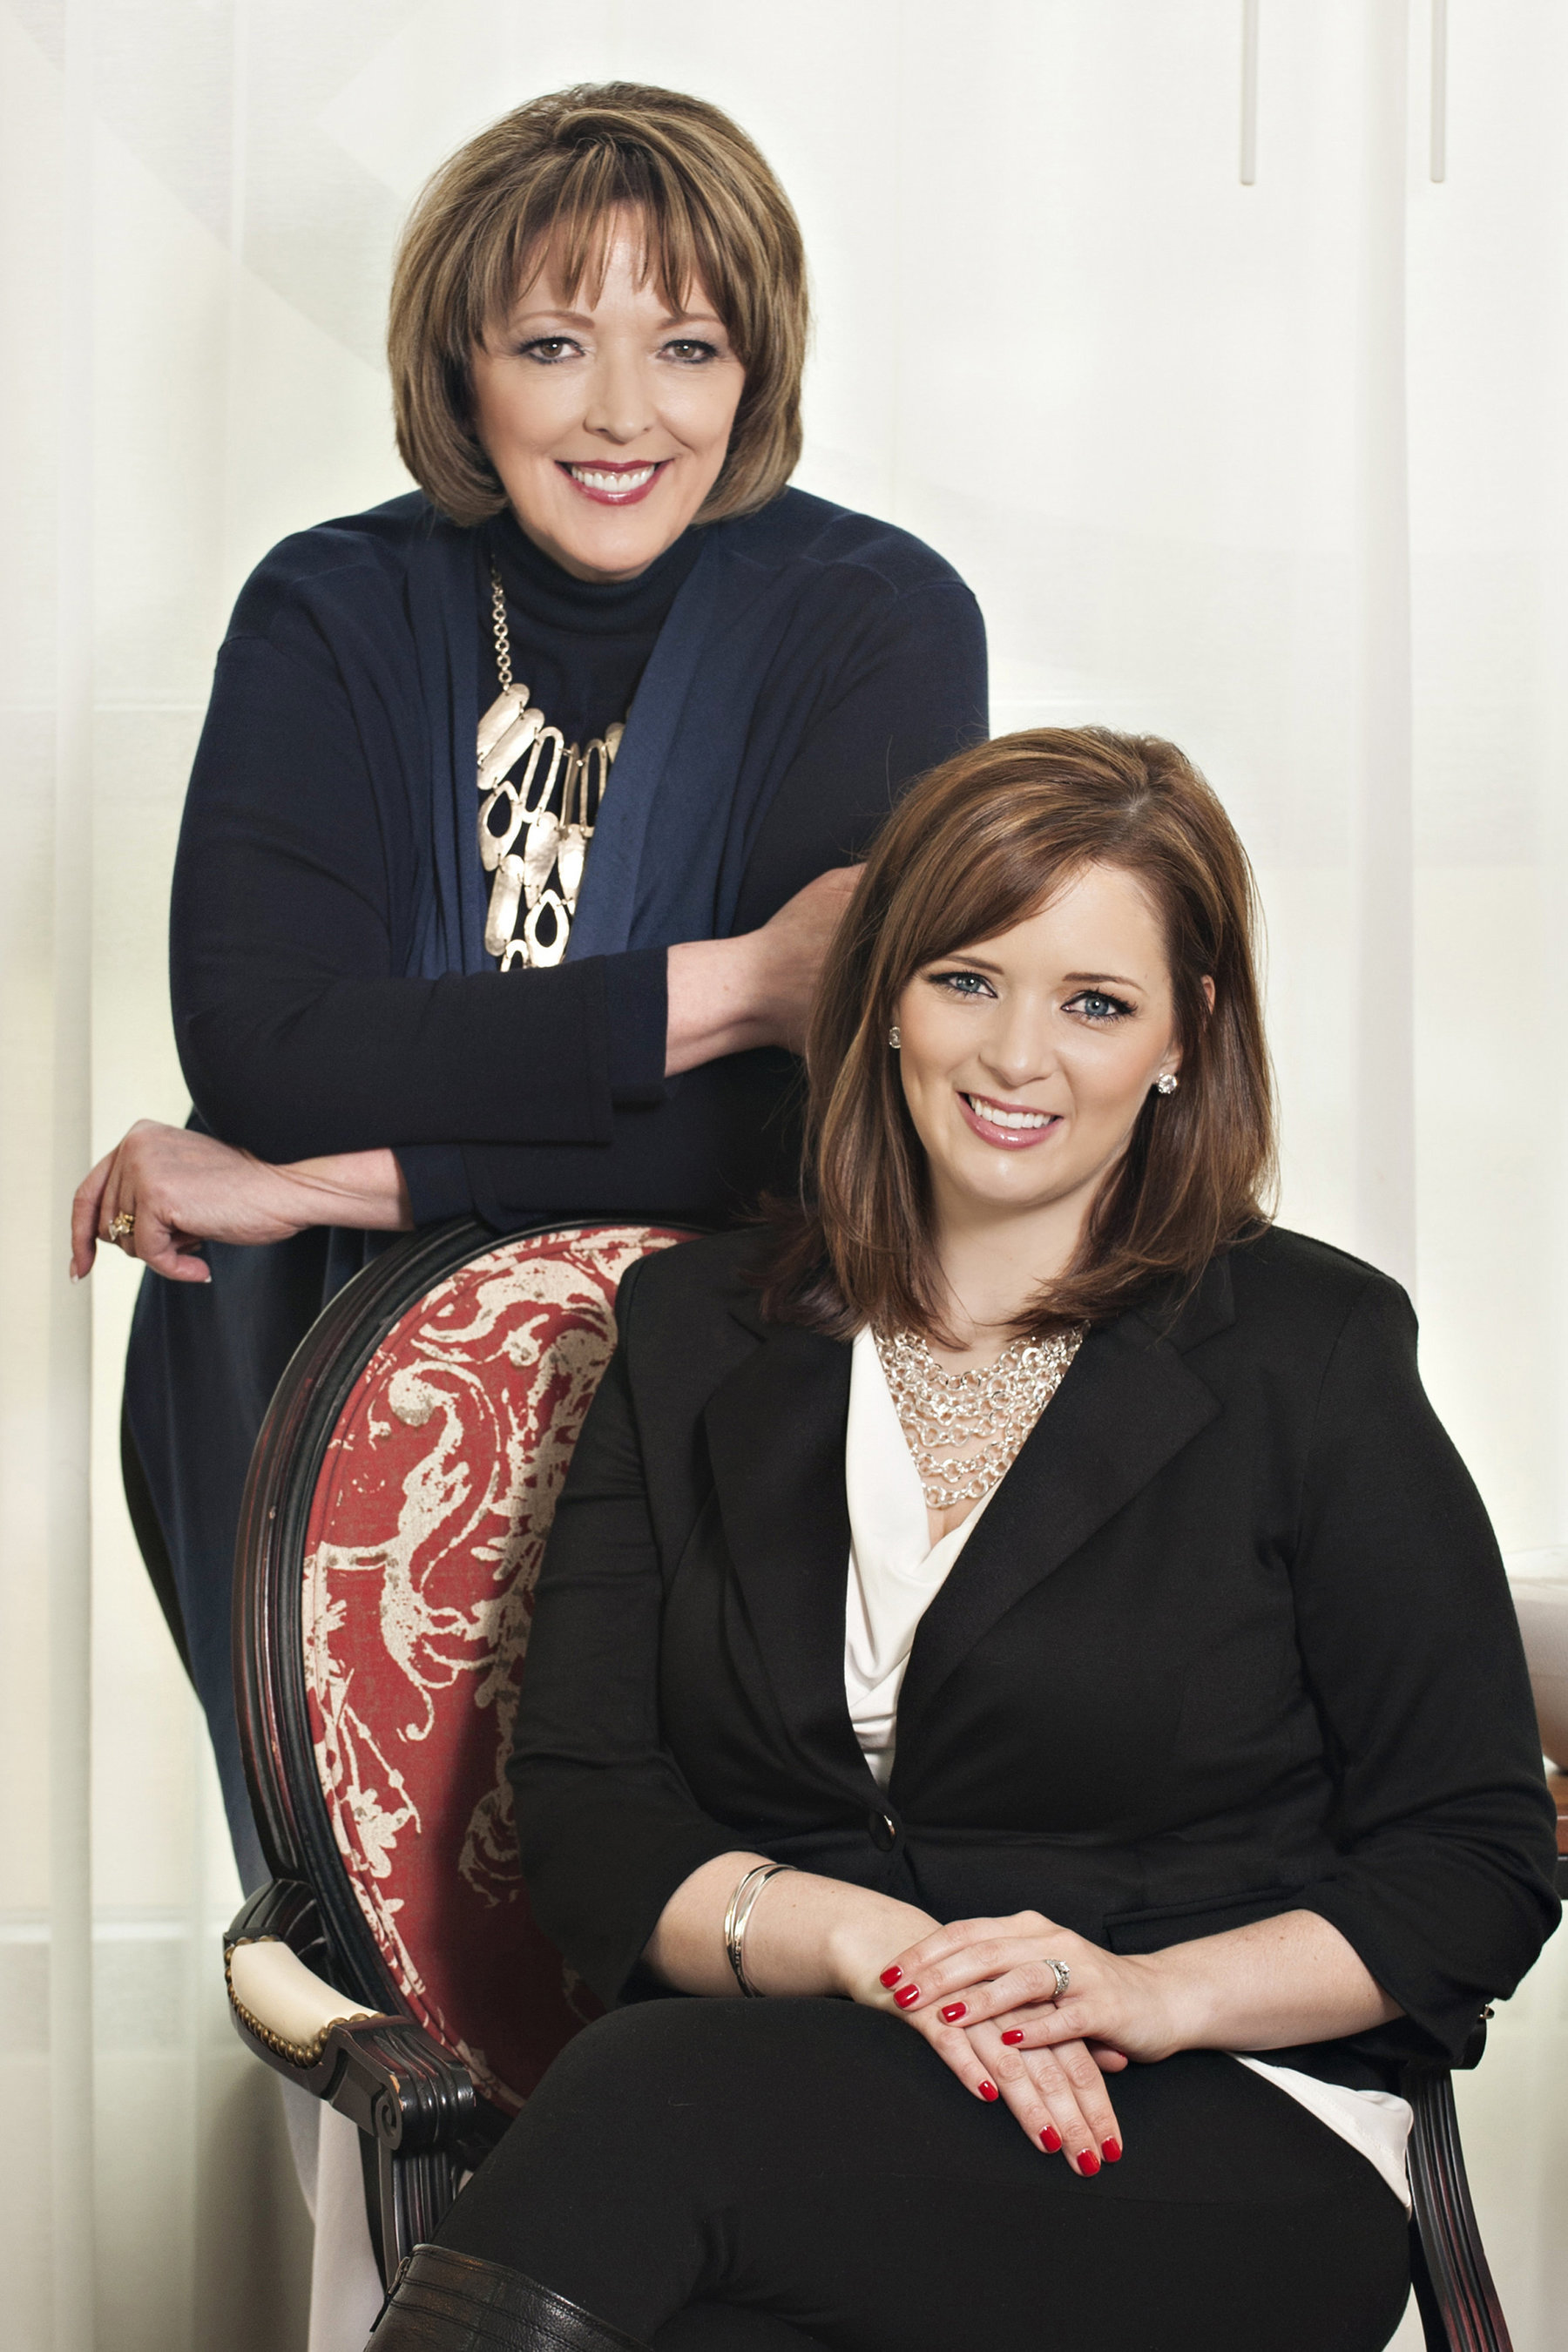 Gail Doby (standing) and Erin Weir (sitting) (PRNewsFoto/Design Success University)